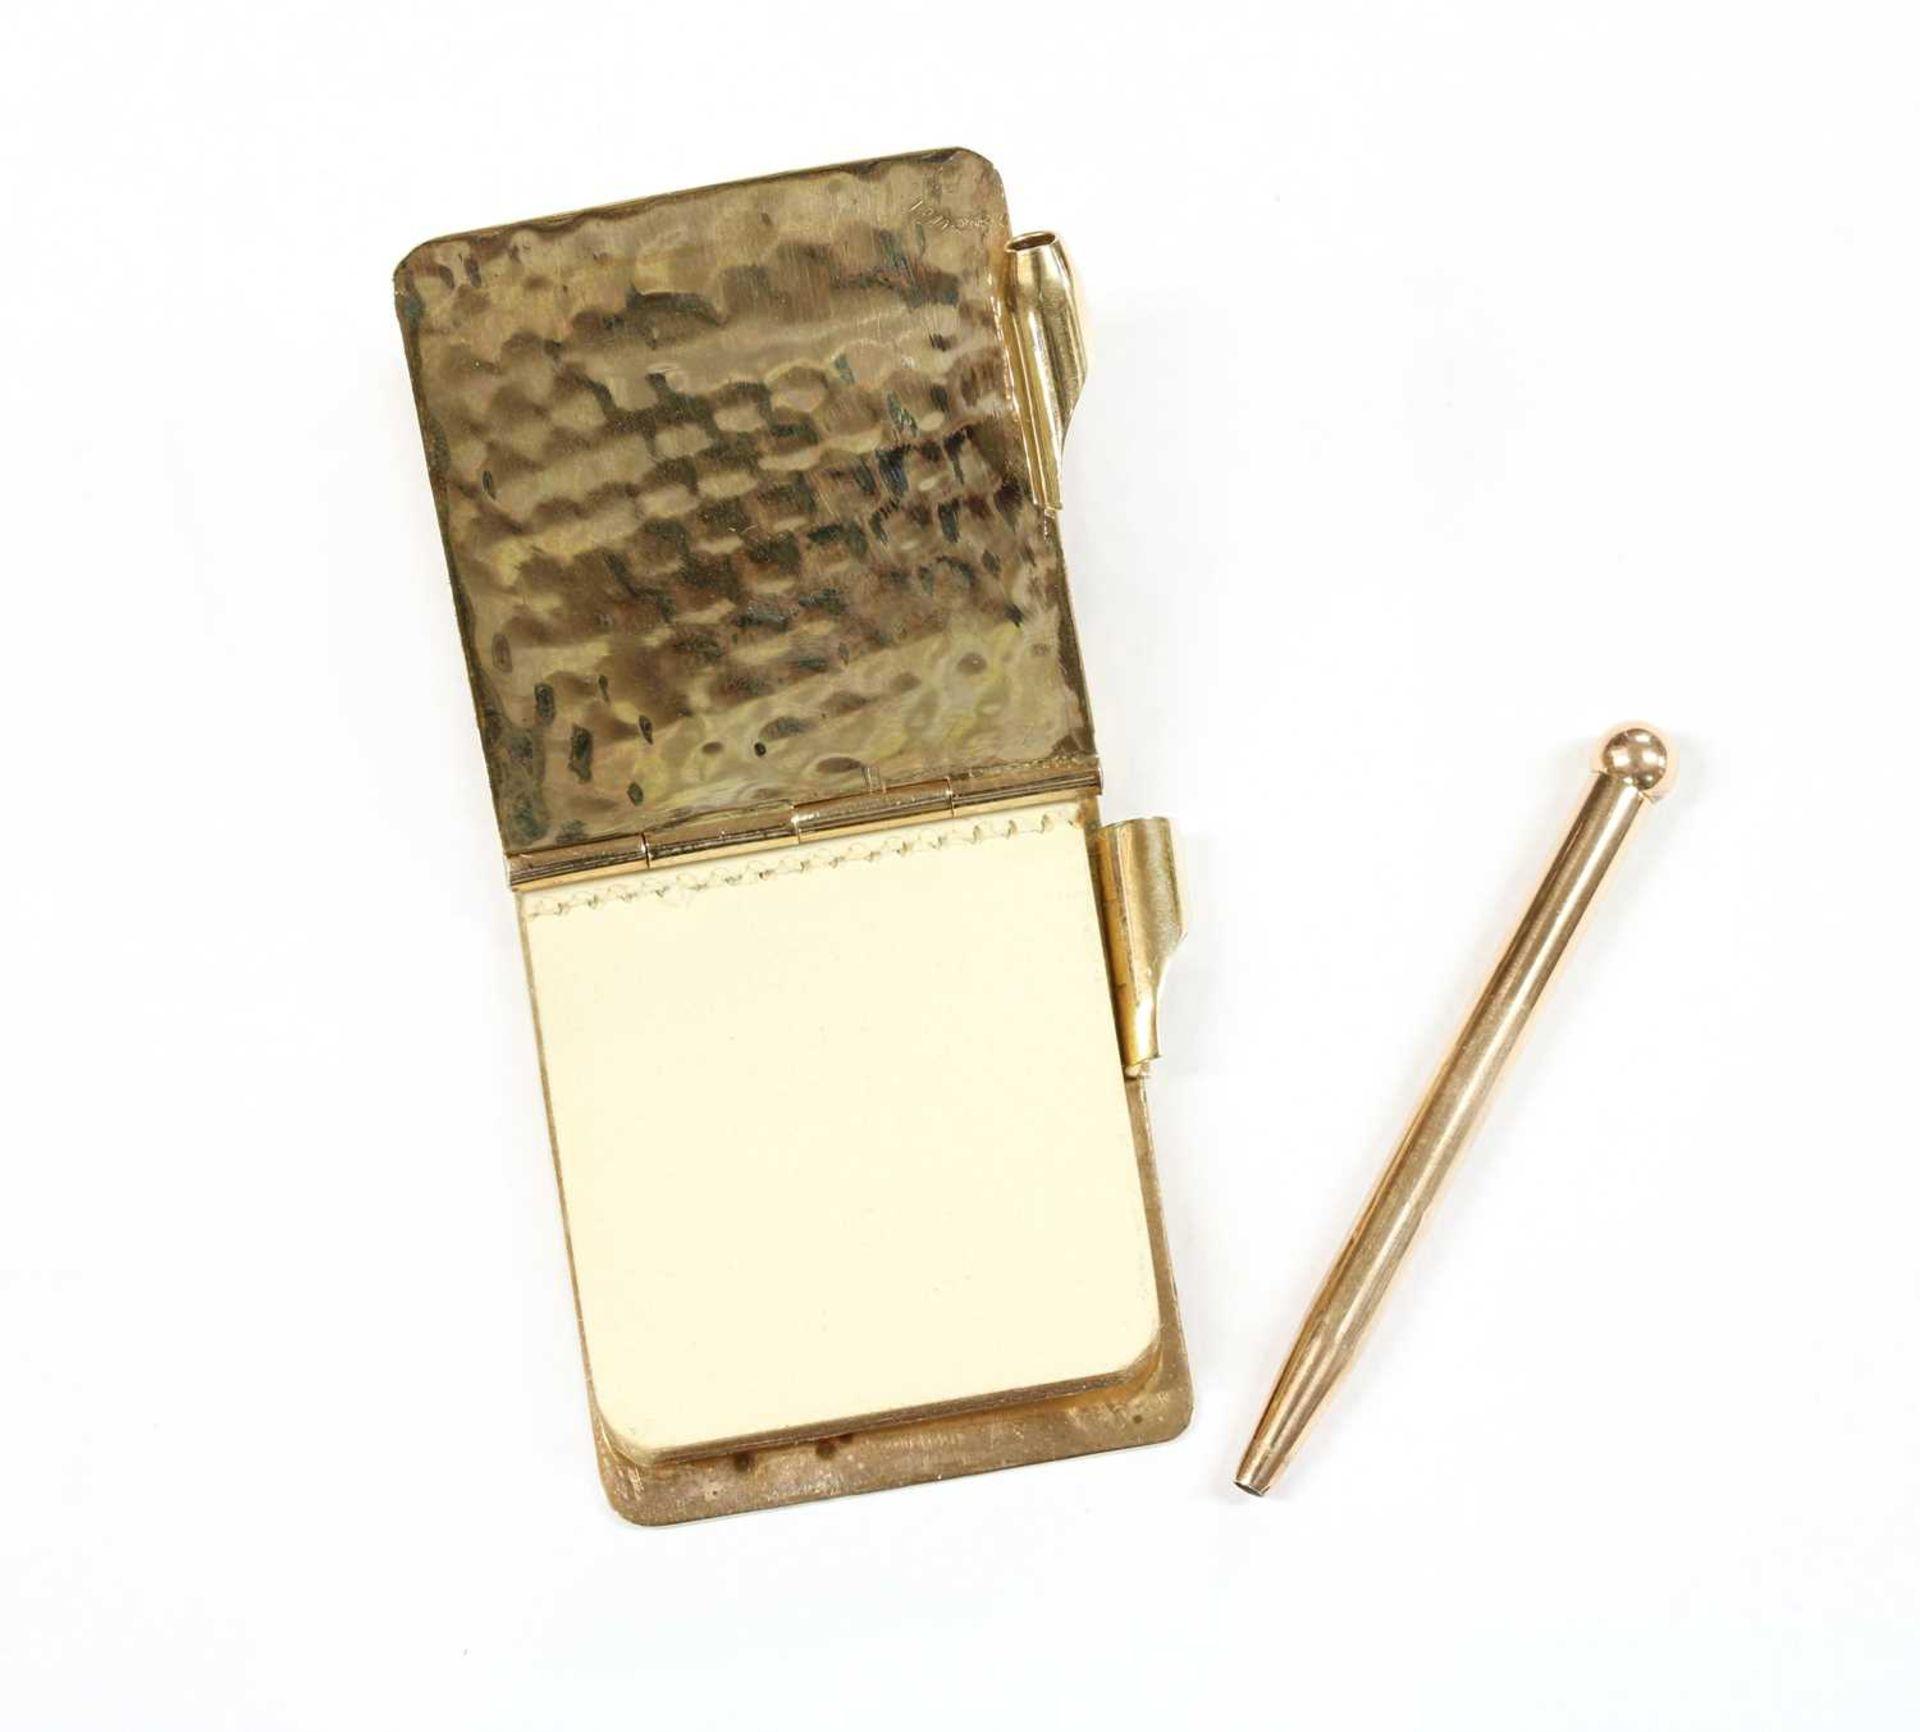 A 9ct gold aide-mémoire, - Image 3 of 3